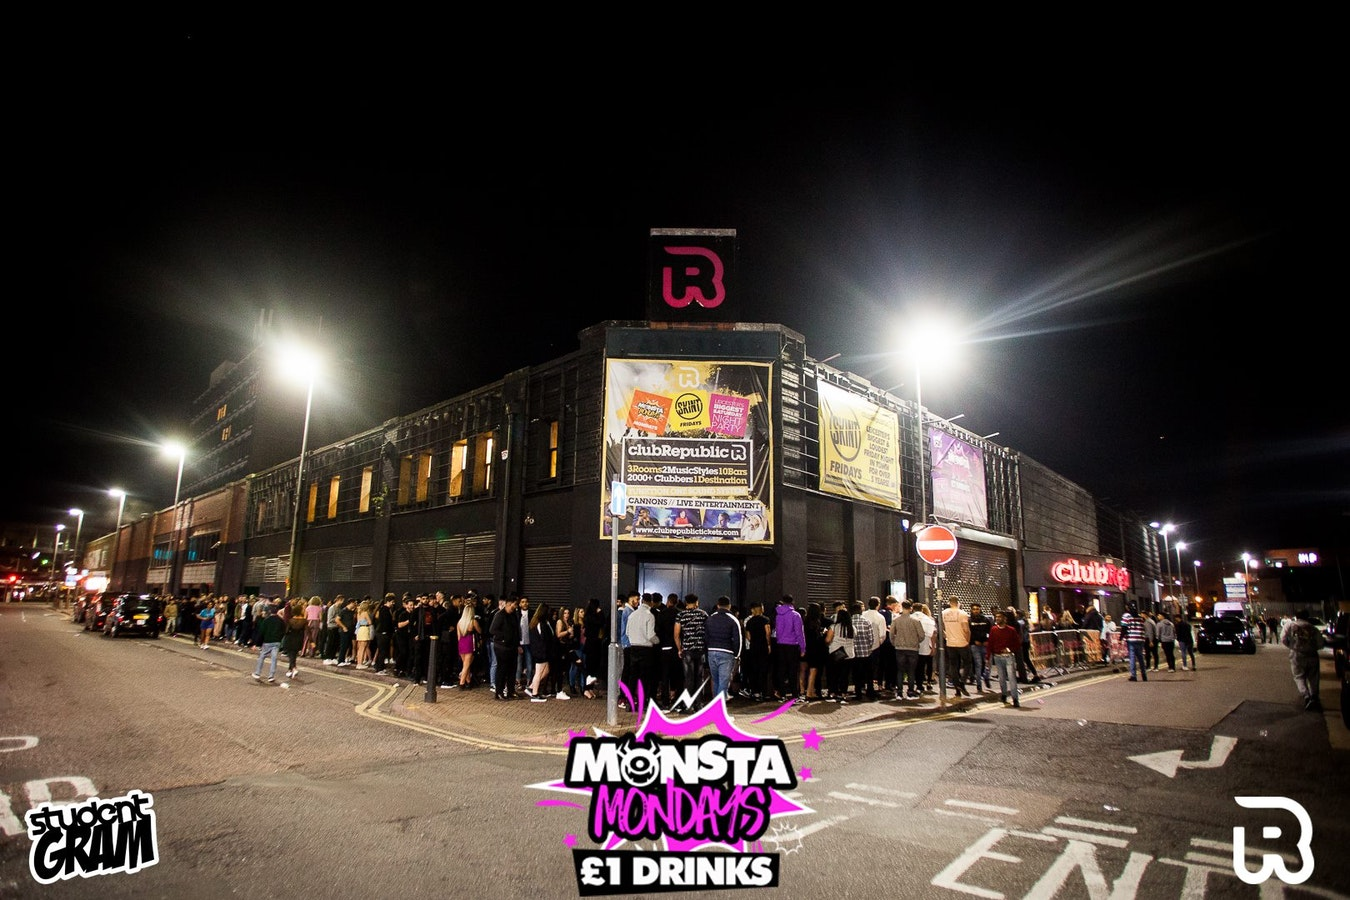 Monsta Mondays – Freshers UniClash with £1 Drinks – Club Republic